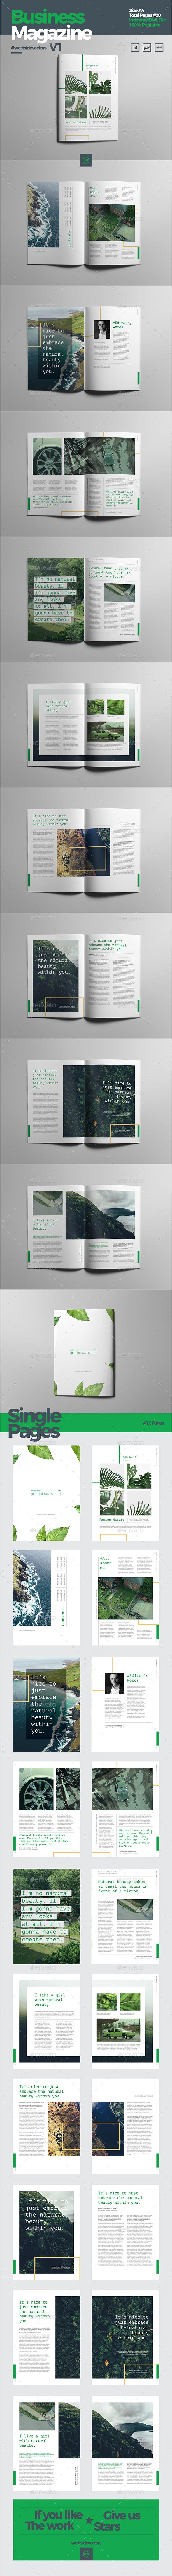 GraphicRiver Magazine 20356533